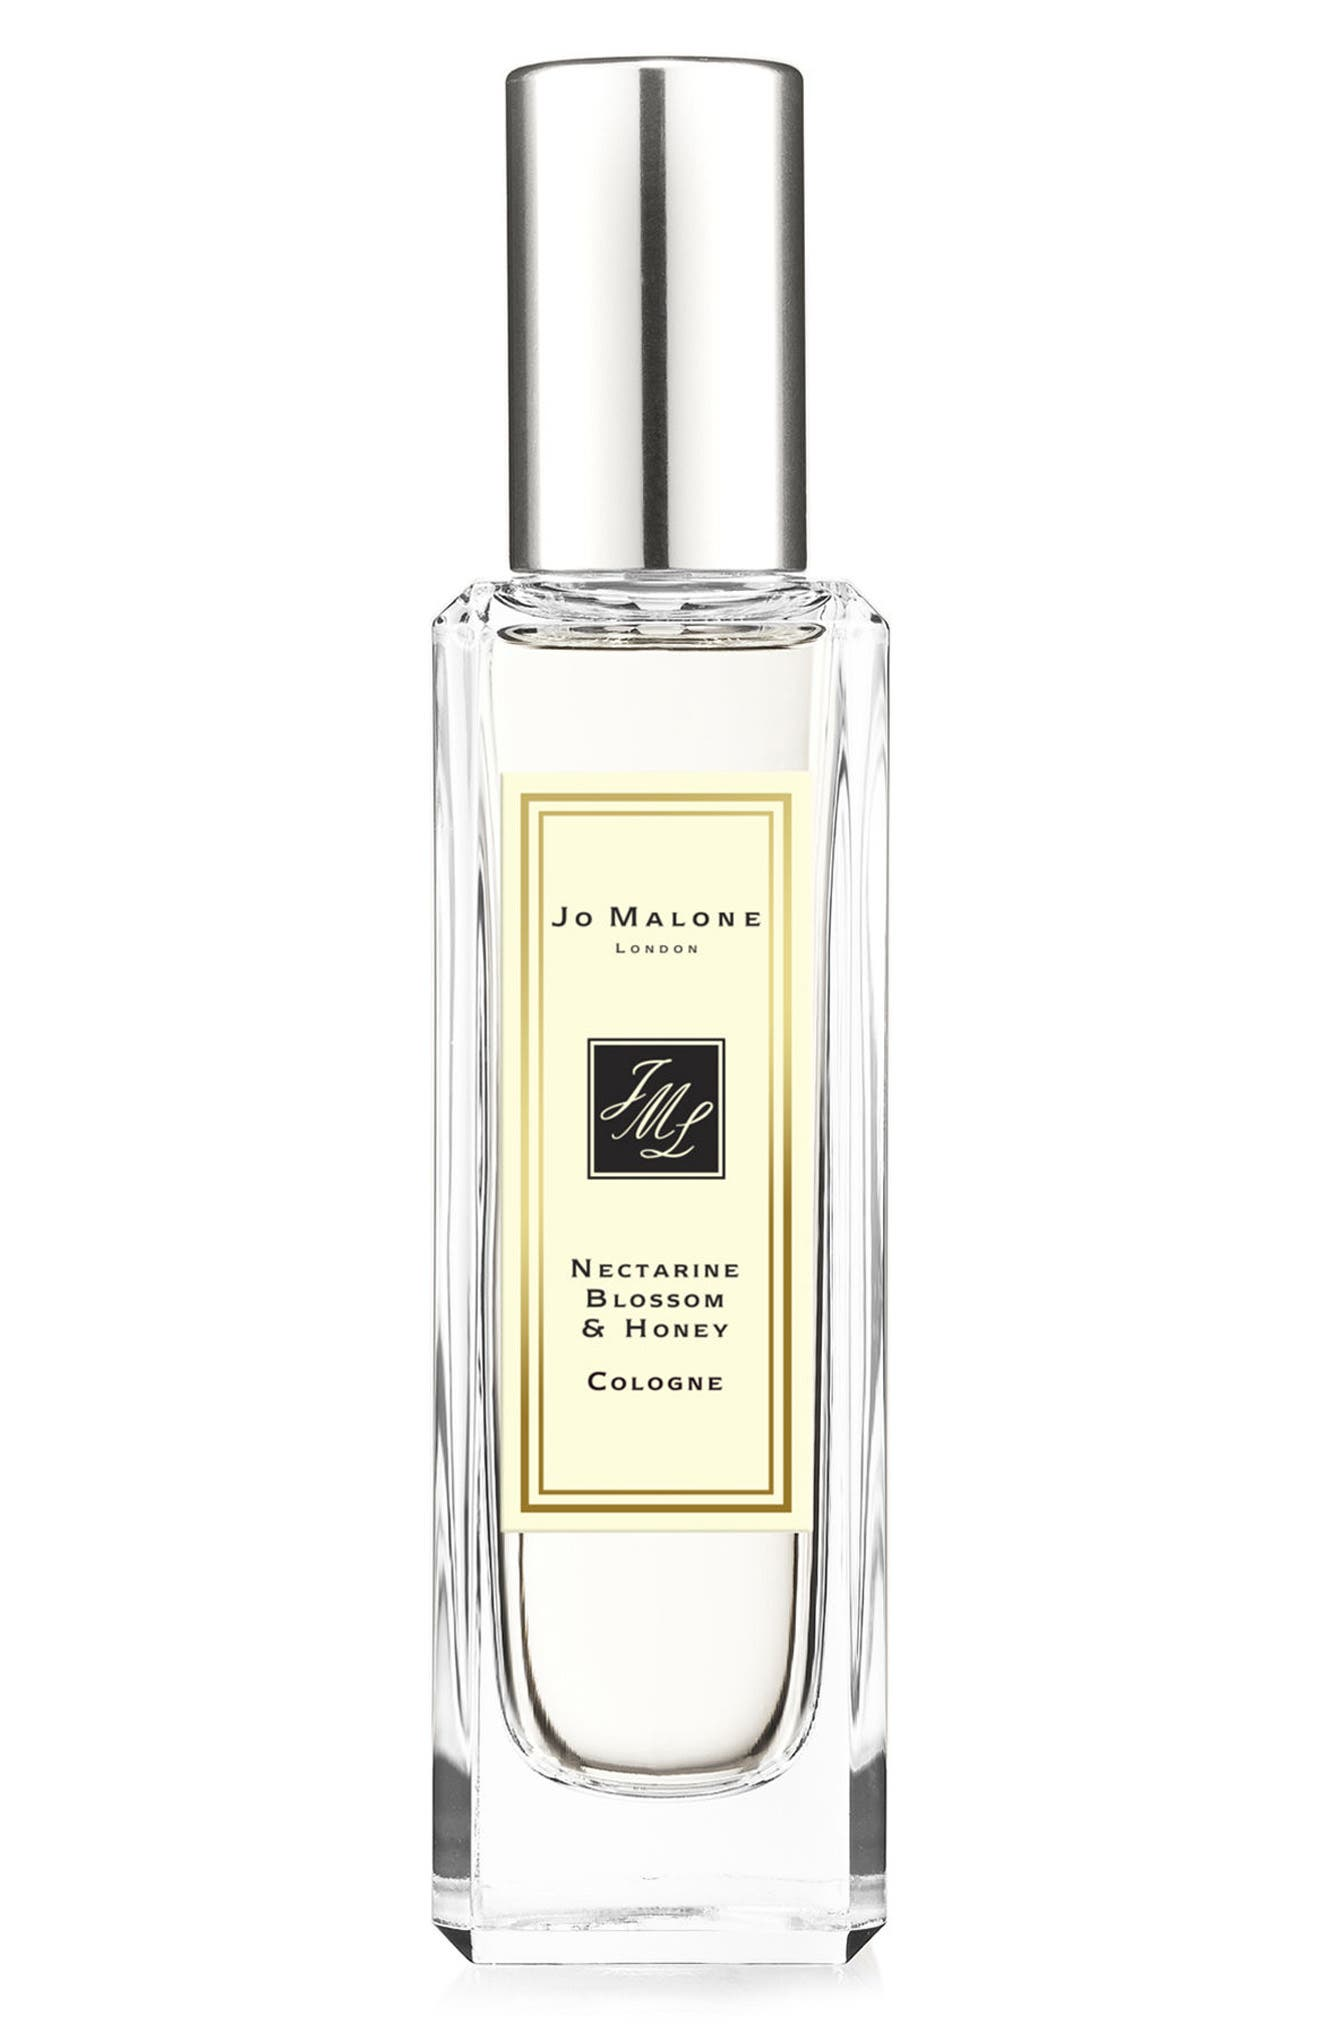 Jo Malone London™ Nectarine Blossom & Honey Cologne